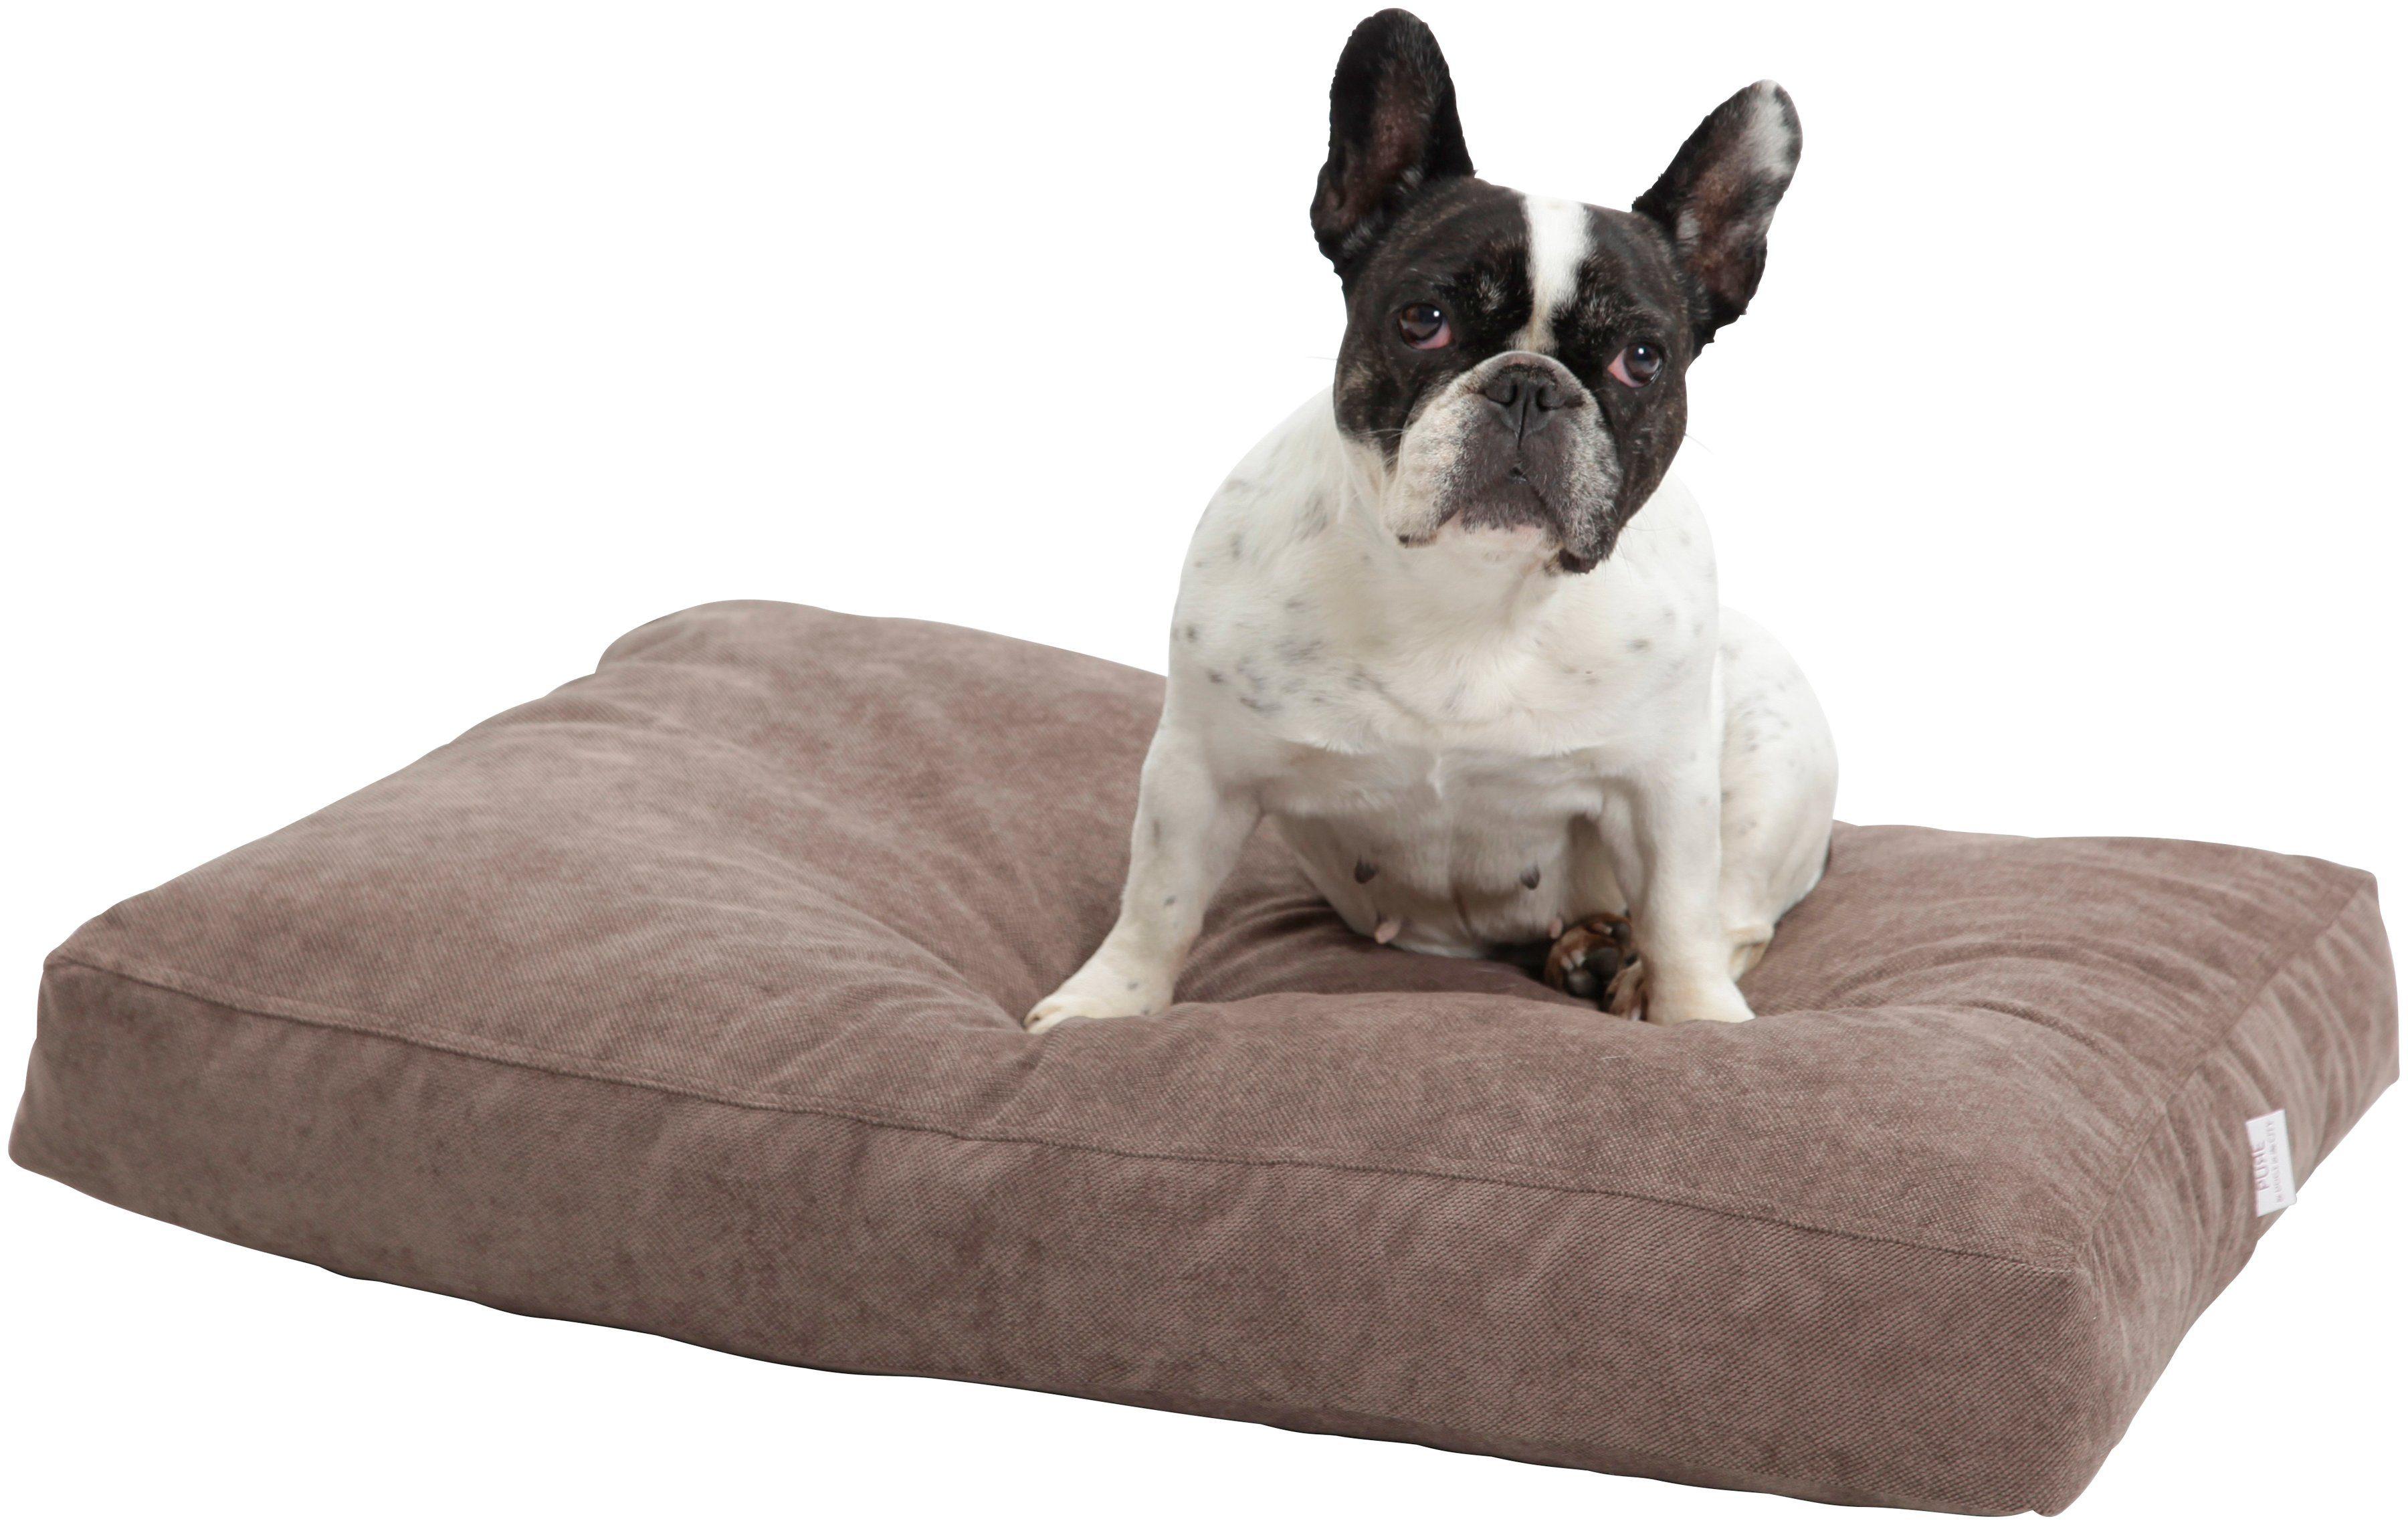 Hundekissen und Katzenkissen »Madison«, B/T/H: 100/80/10 cm, Braun